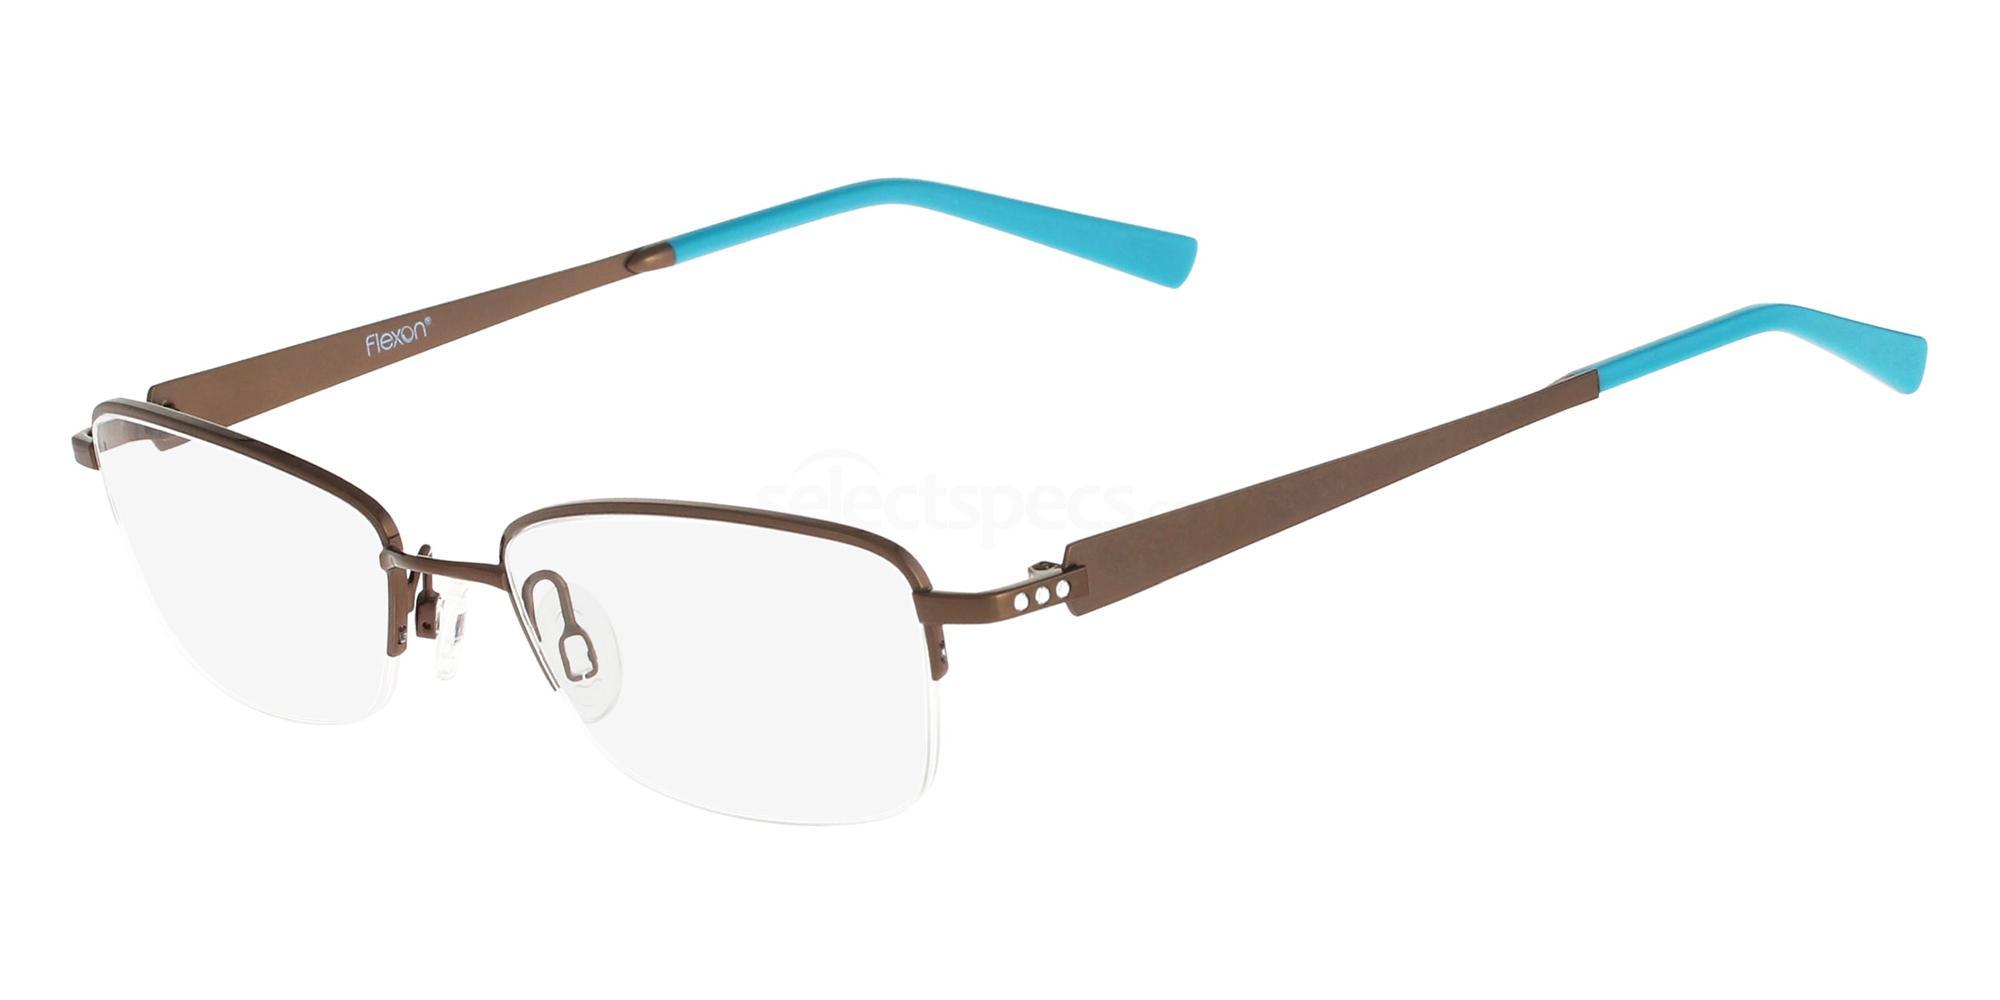 210 FLEXON HEPBURN Glasses, Flexon